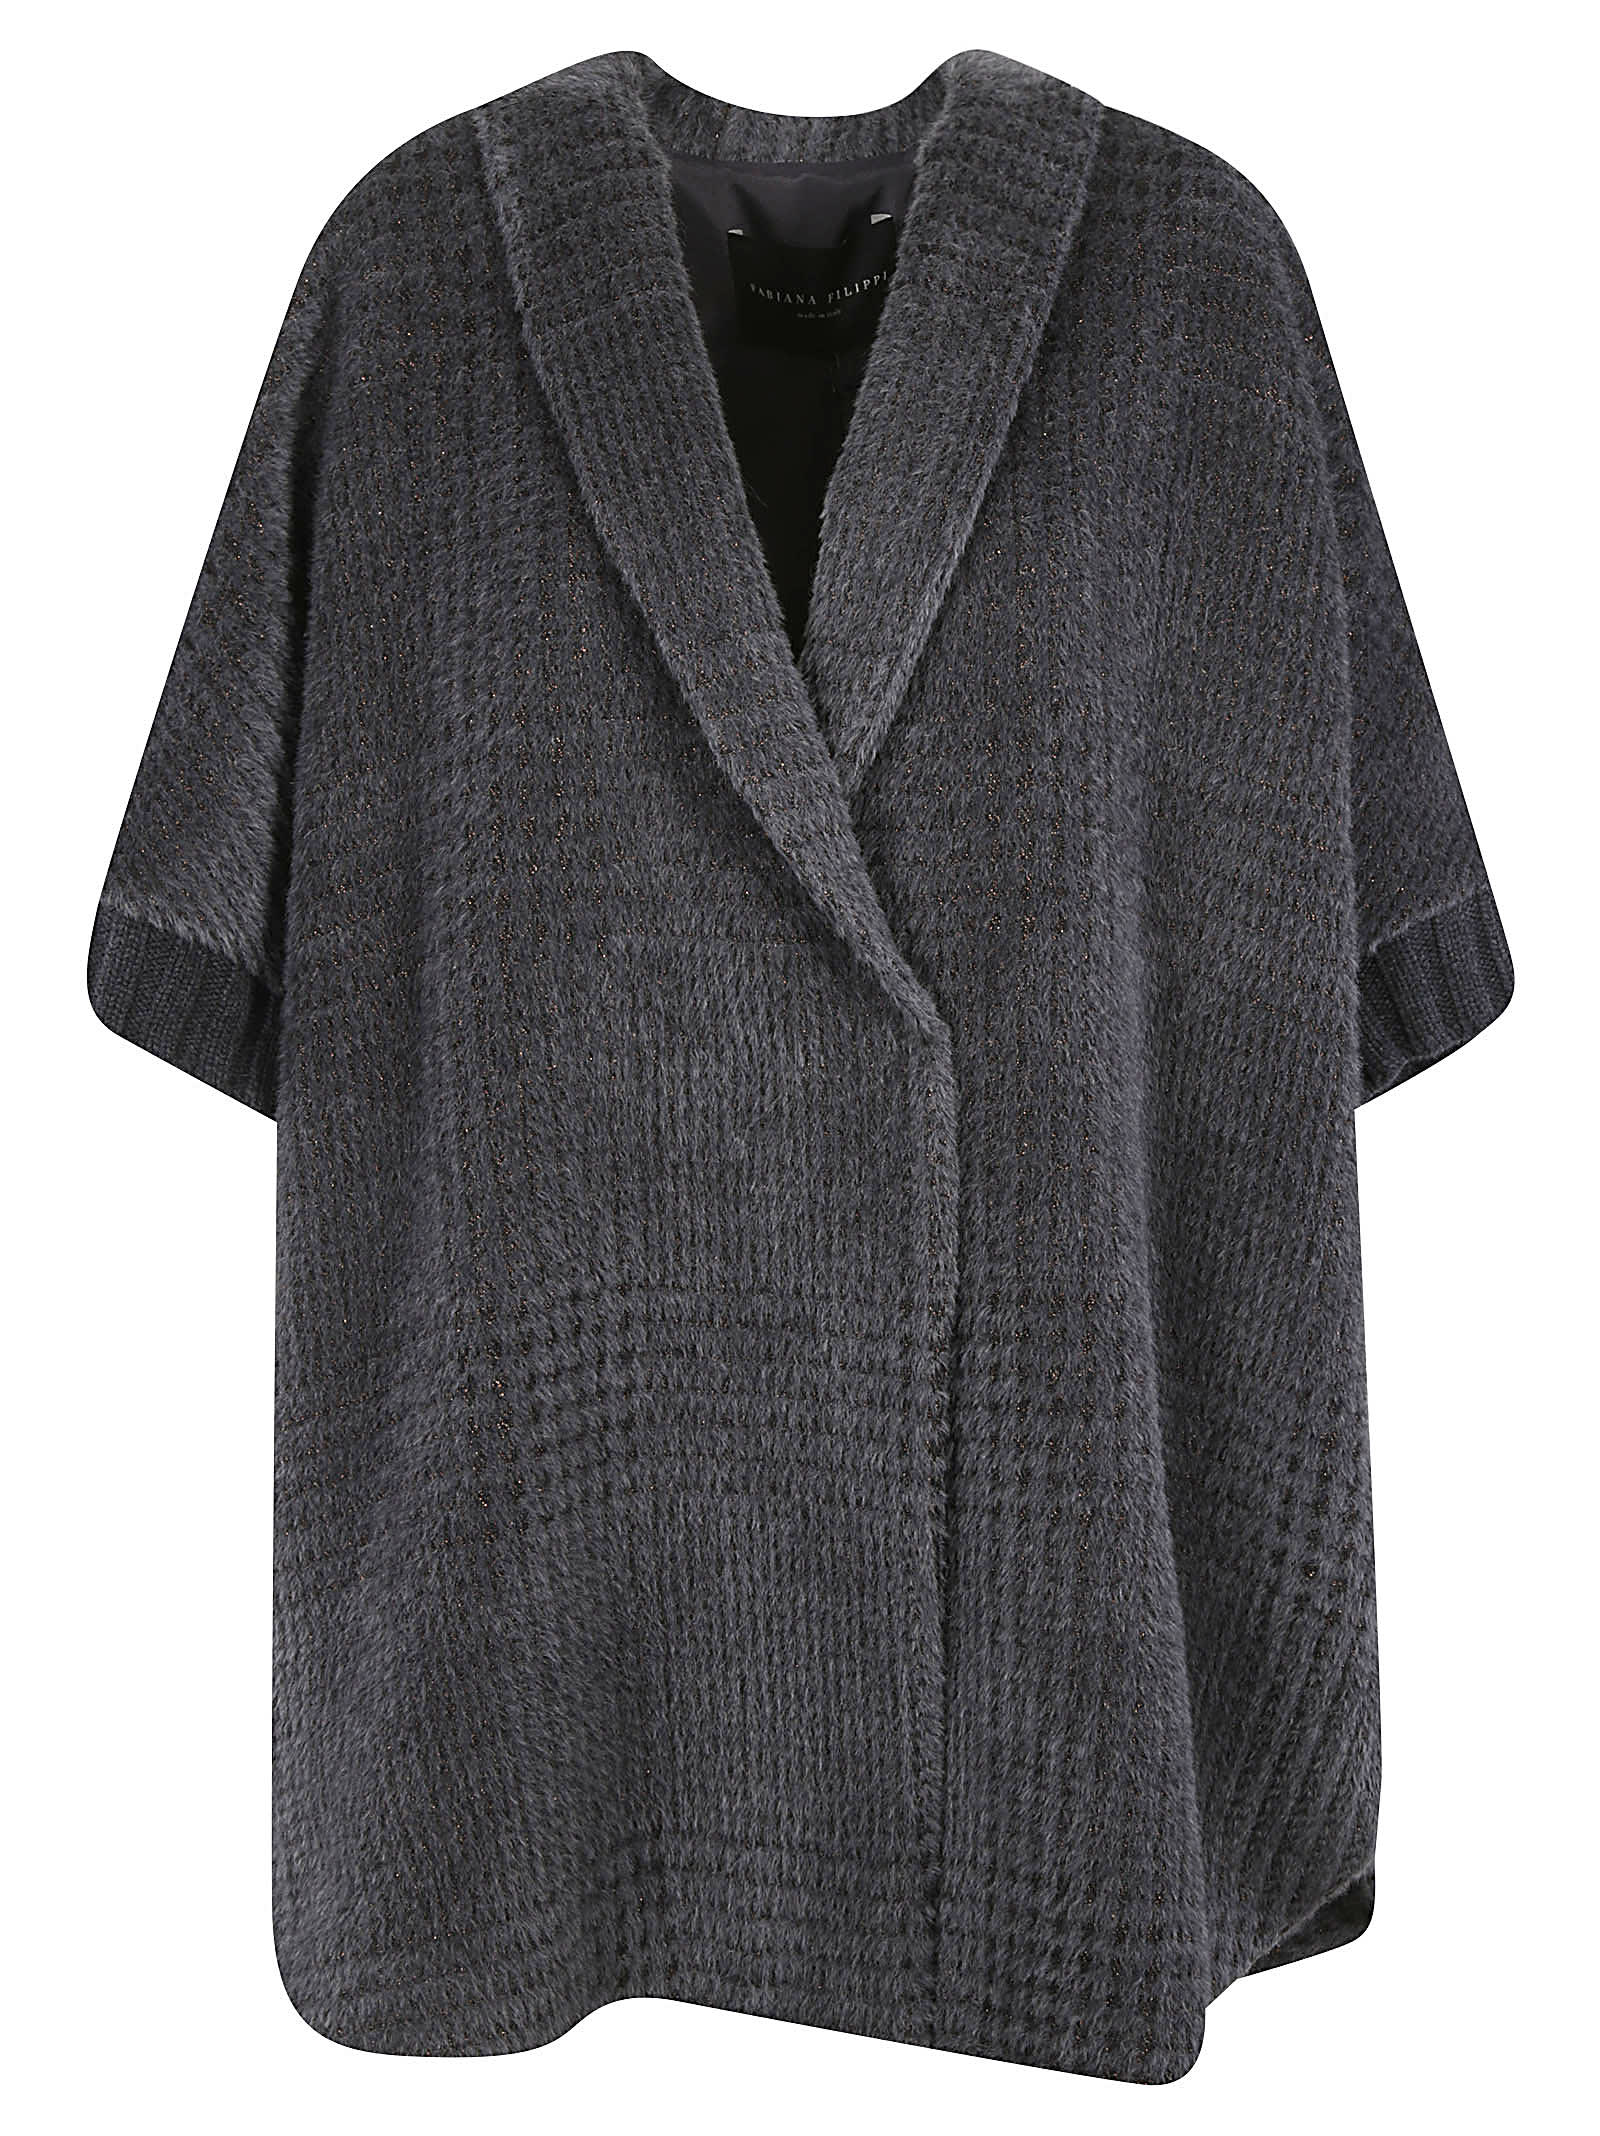 Fabiana Filippi Oversized Woven Coat